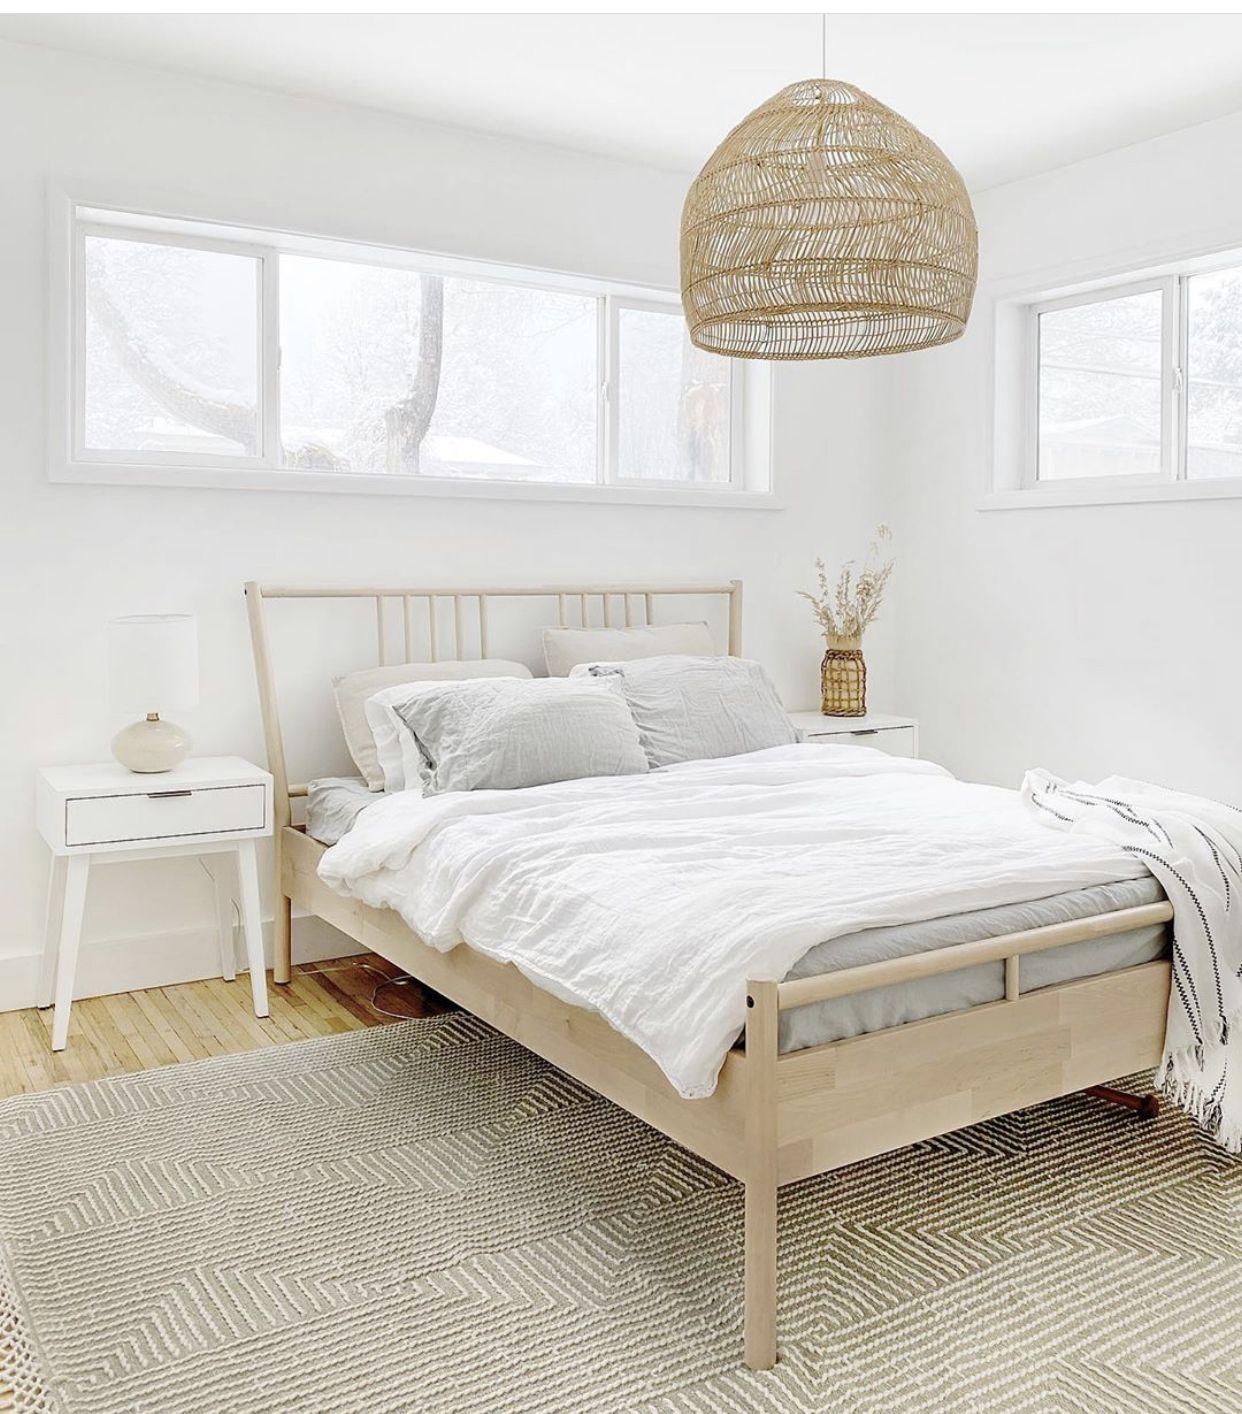 8x10 rug under bed in 2020 Rug under bed, Bed, Home decor